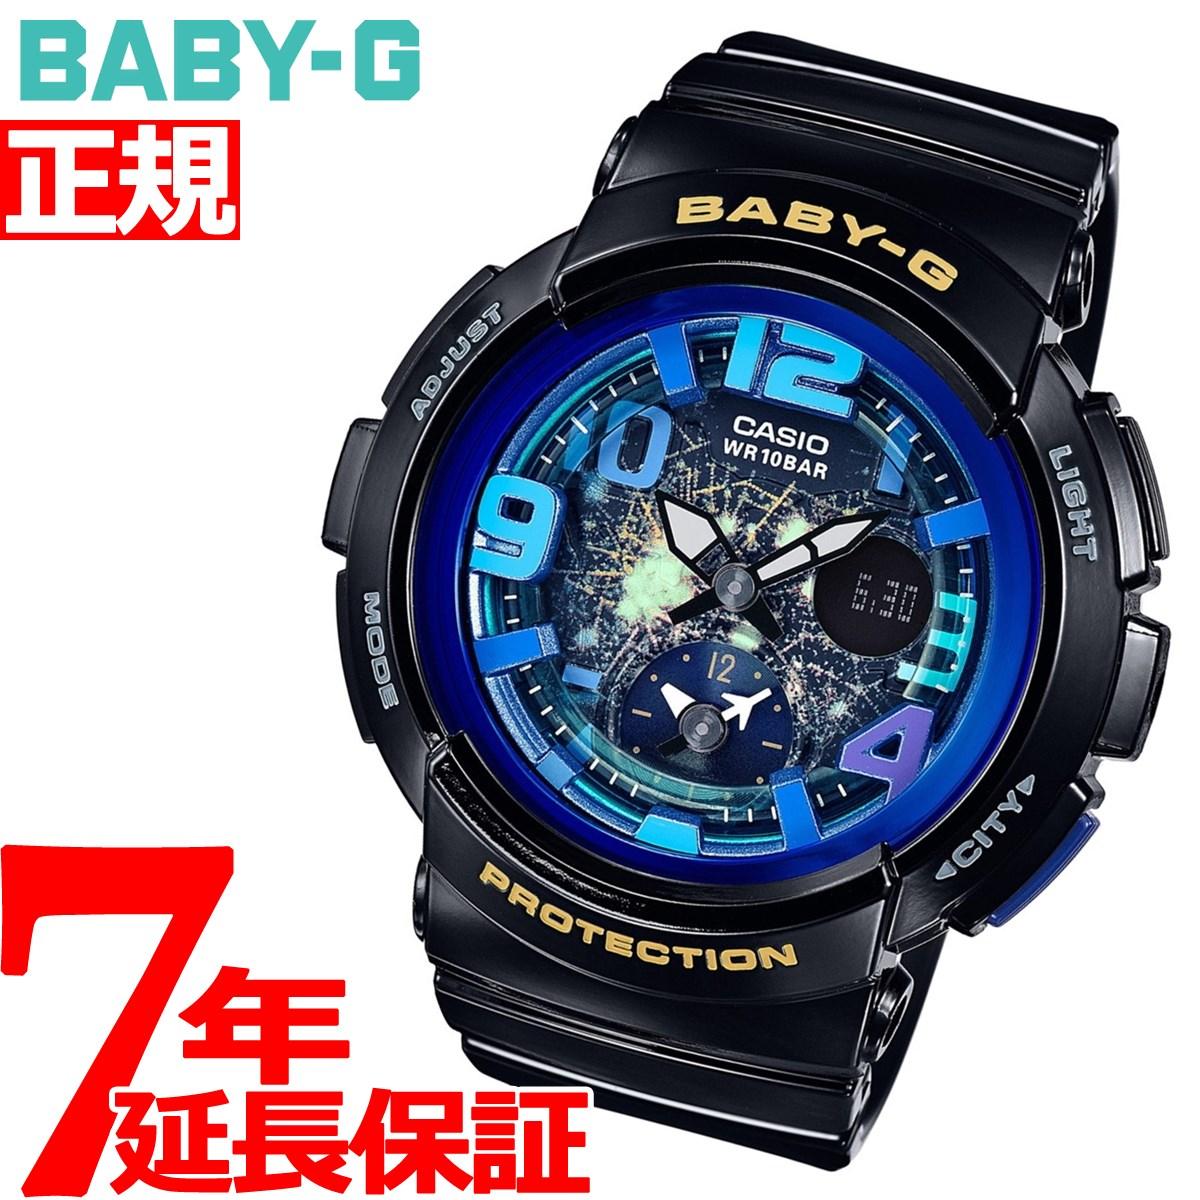 CASIO BABY-G カシオ ベビーG 腕時計 レディース ビーチ・トラベラー ブラック アナデジ BGA-190GL-1BJF